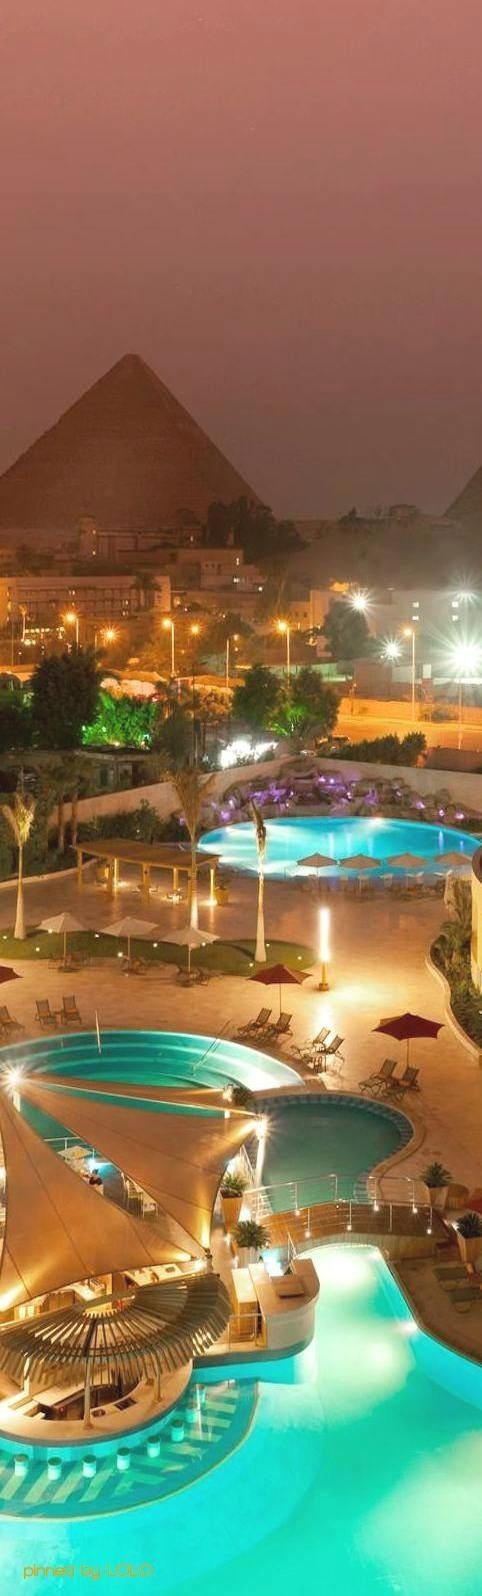 Le Méridien Pyramids Hotel Spa Egypt Lolo Egypt Vacation Para Obtener Información Acceda A Nuestro Sitio Https Stor Egypt Travel Visit Egypt Egypt